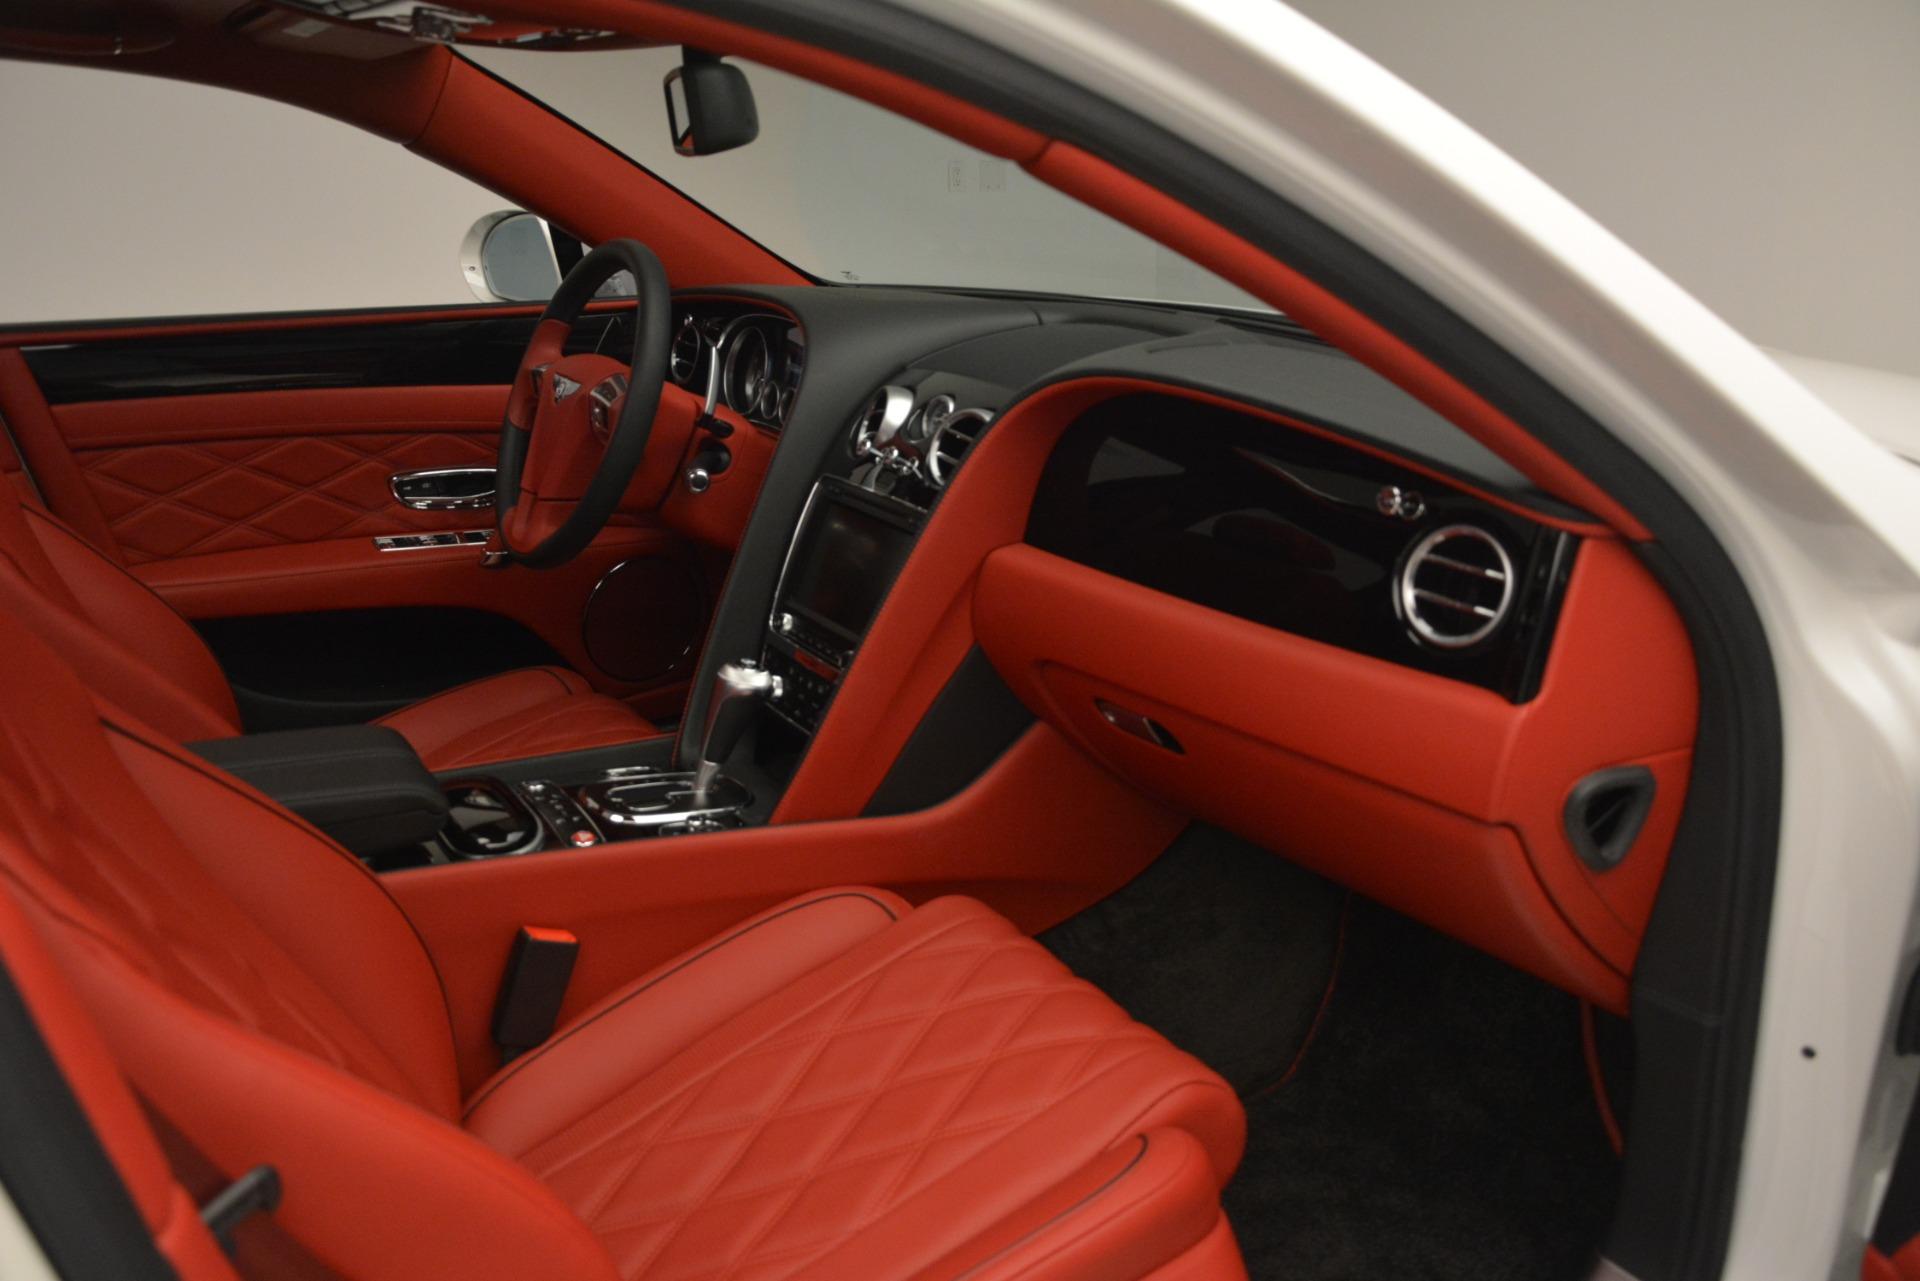 Used 2016 Bentley Flying Spur V8 For Sale In Westport, CT 3265_p28